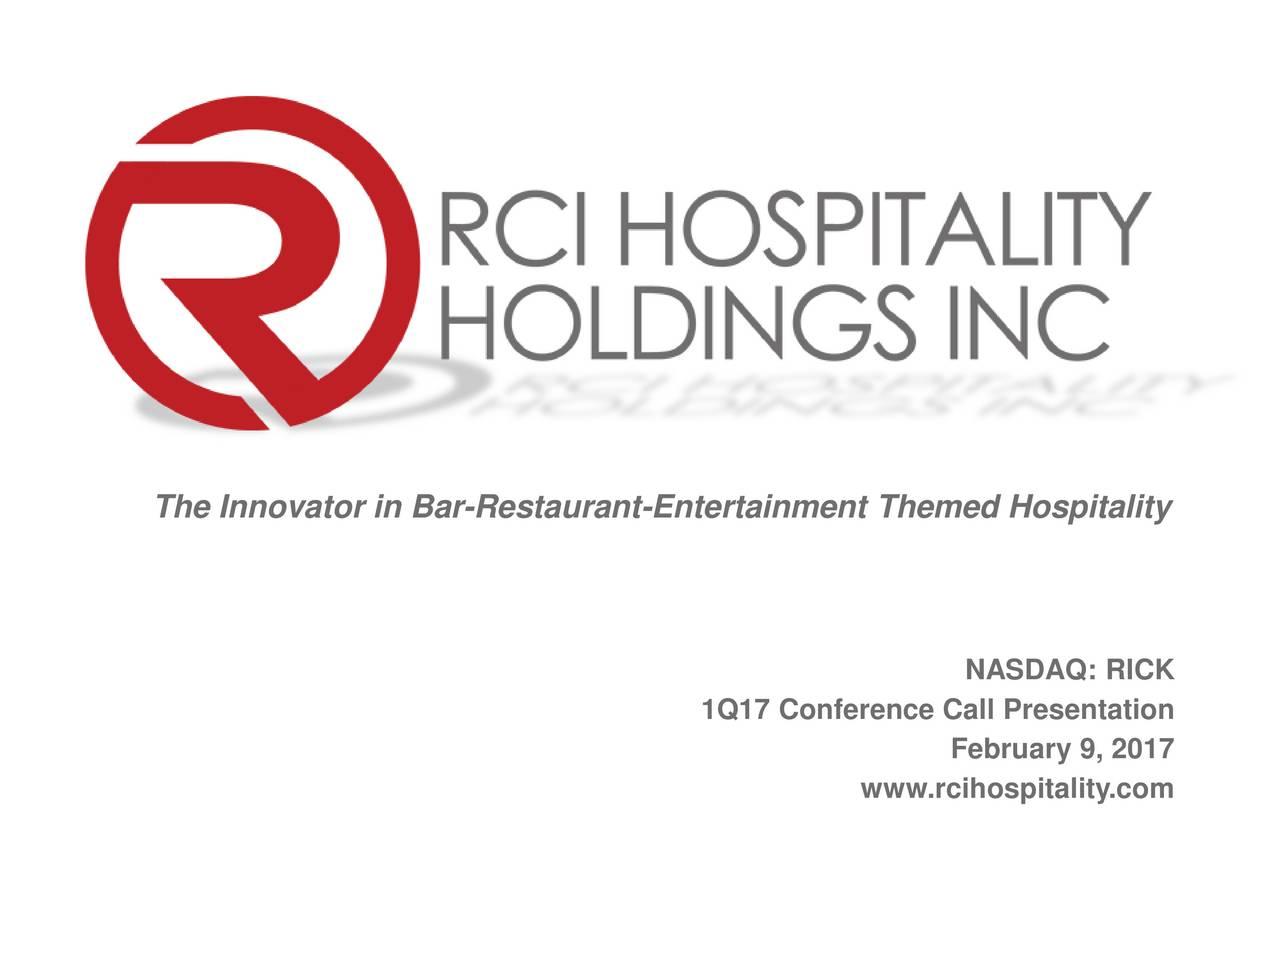 NASDAQ: RICK 1Q17 Conference Call Presentation February 9, 2017 www.rcihospitality.com